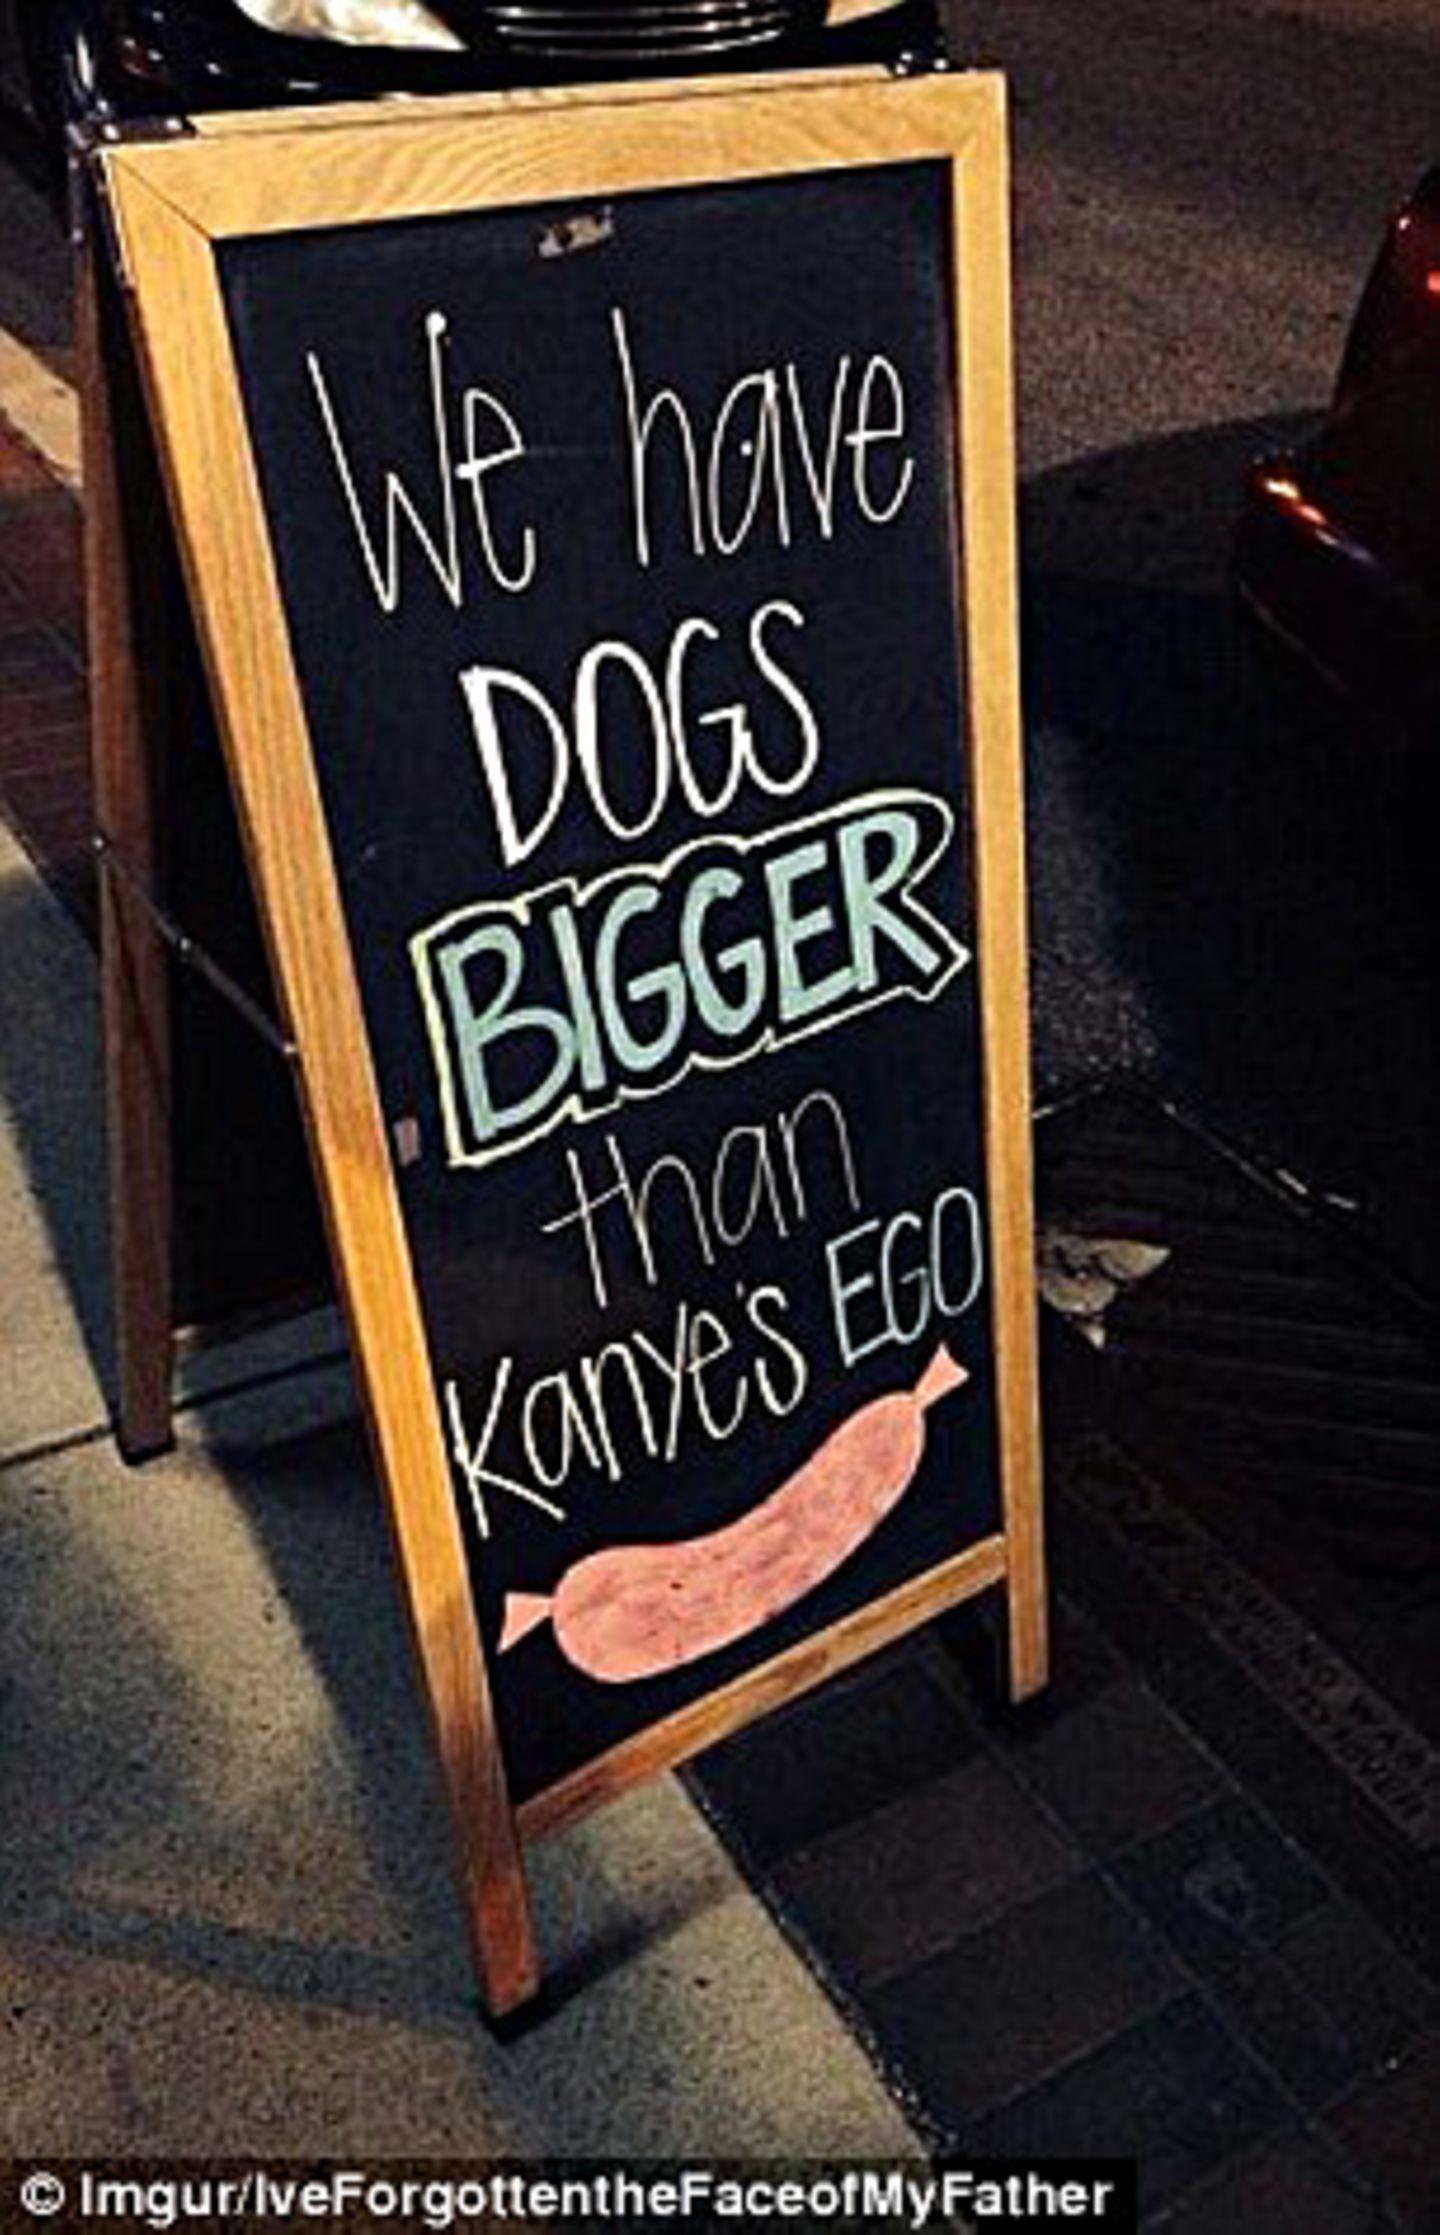 Hier gibt es Hot Dogs, die größer als Kanyes (West) Ego sind.